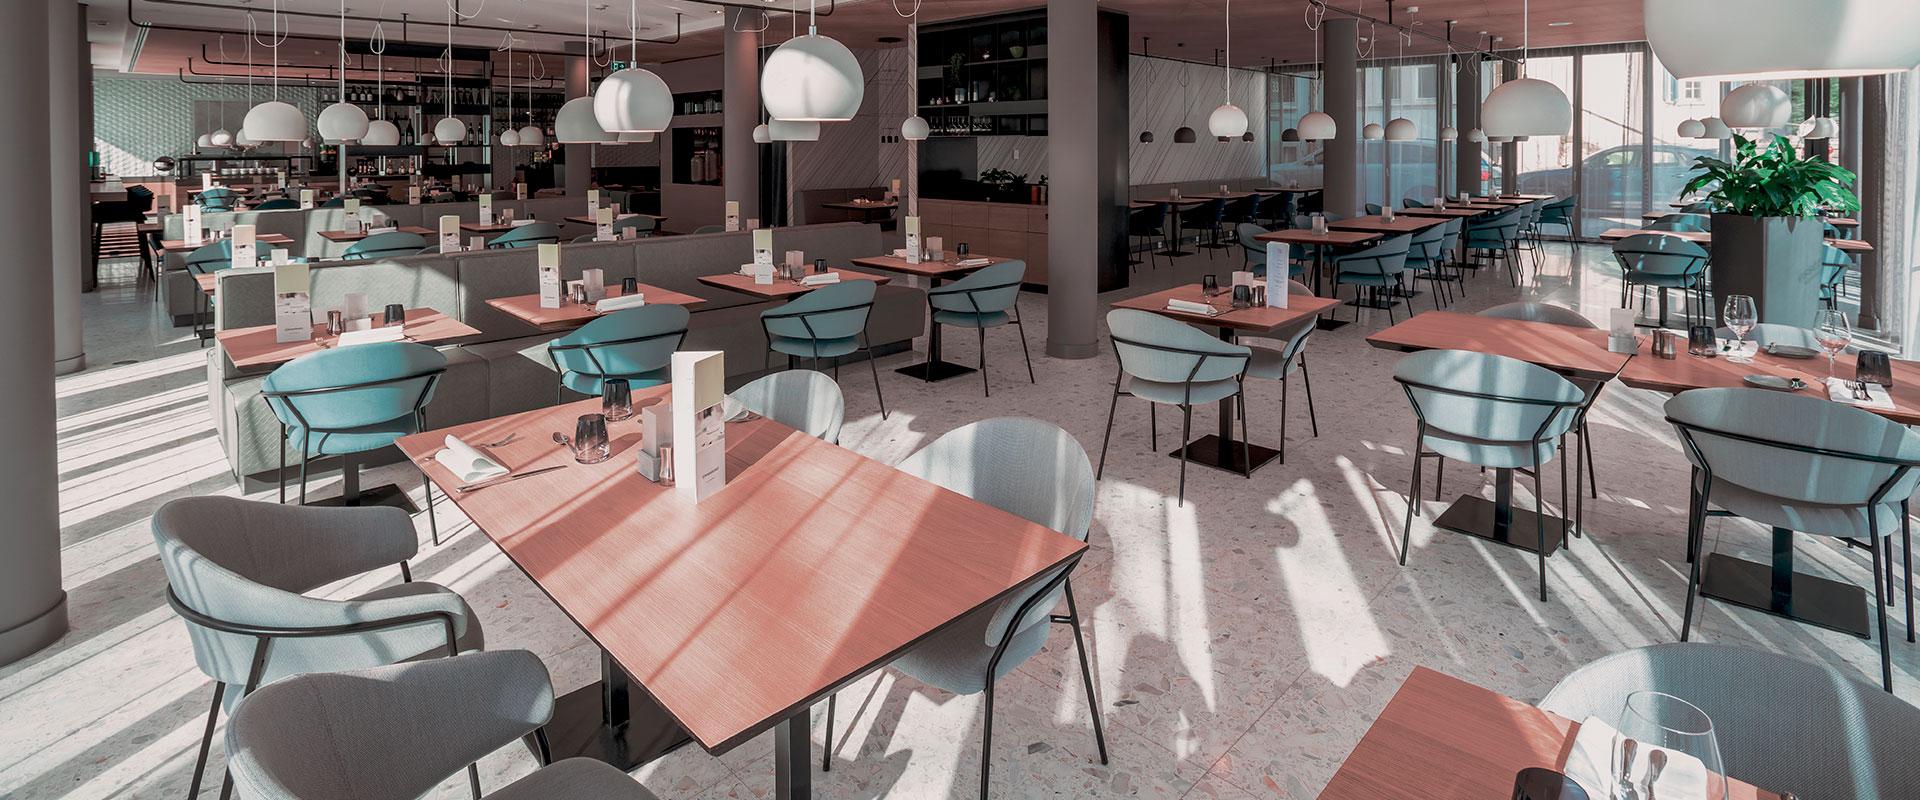 AGGLOTECH-progetto-Hotel-Salinengarten-slider-3